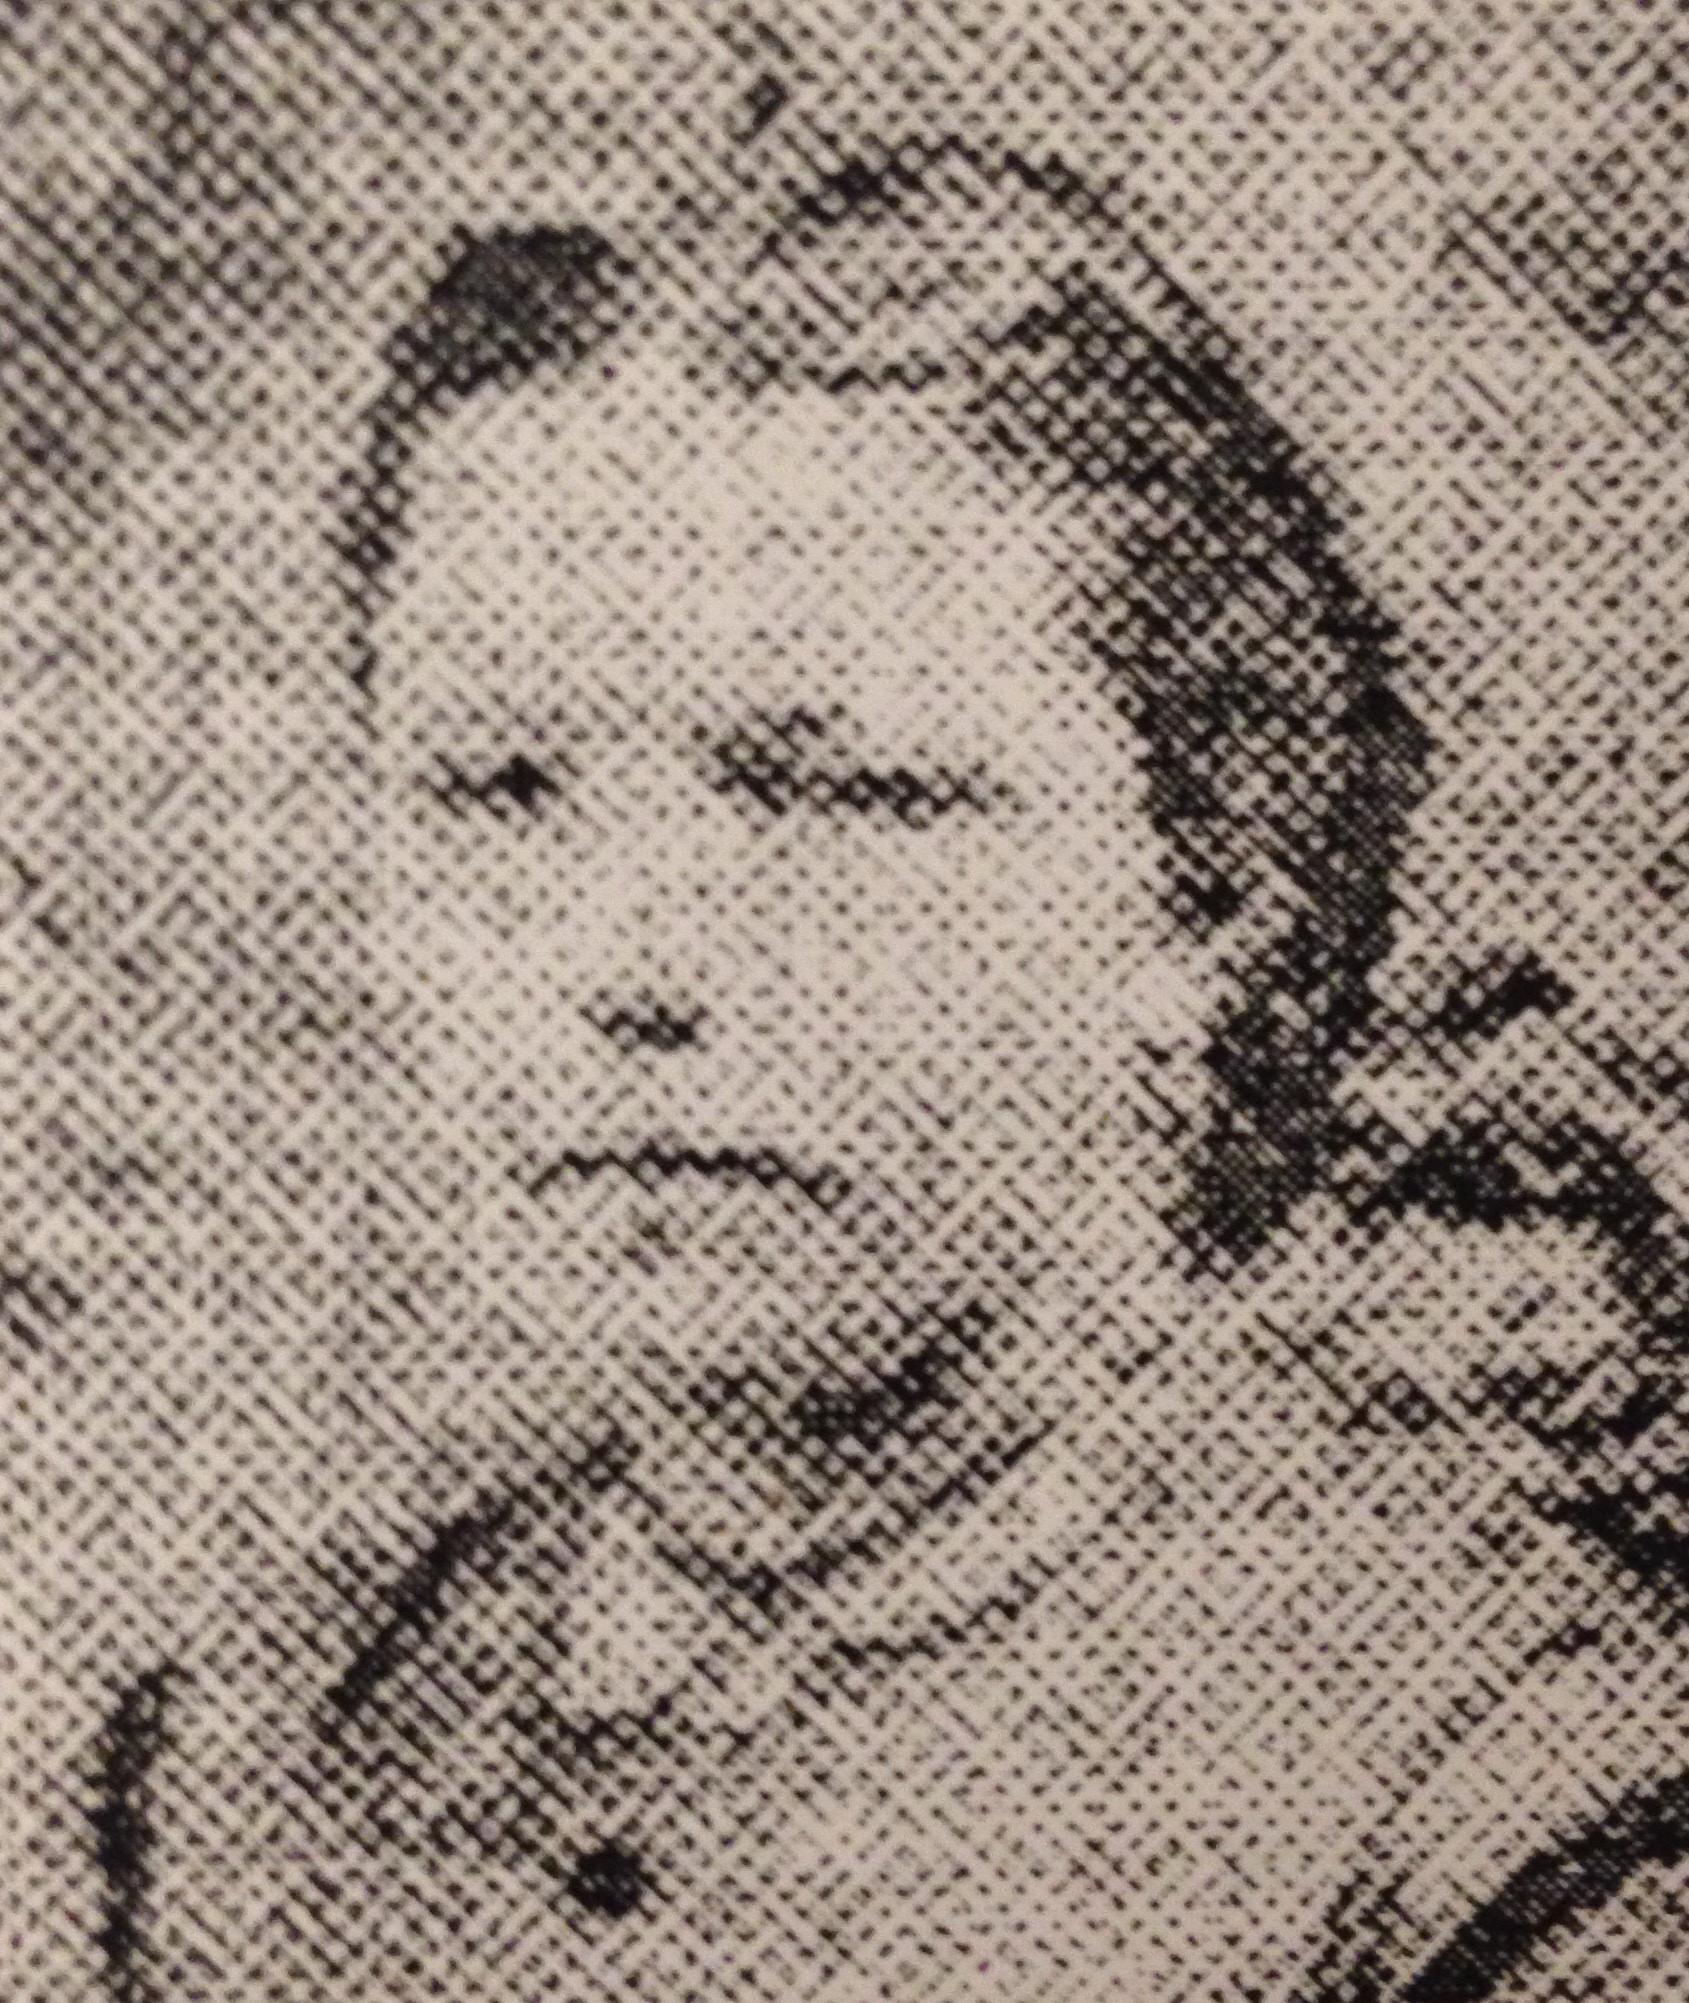 Marie Carstenson